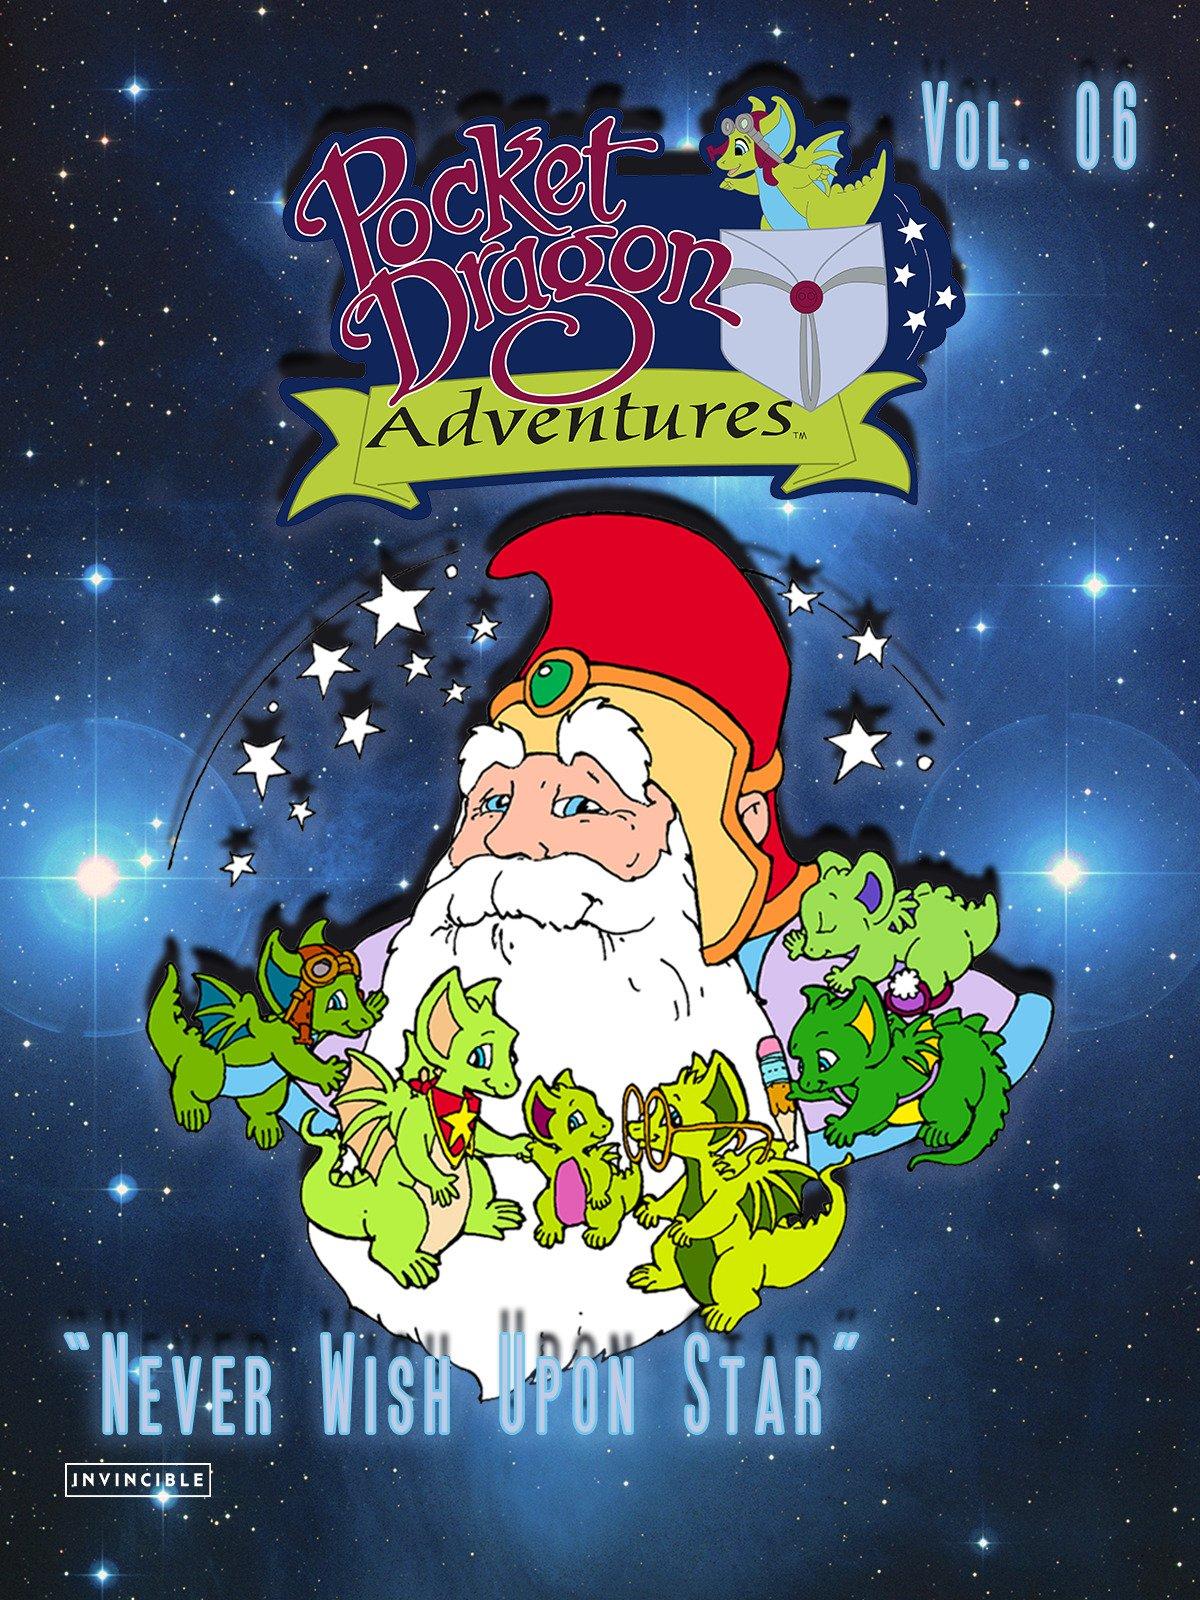 Pocket Dragon Adventures Vol. 06Never wish Upon Star